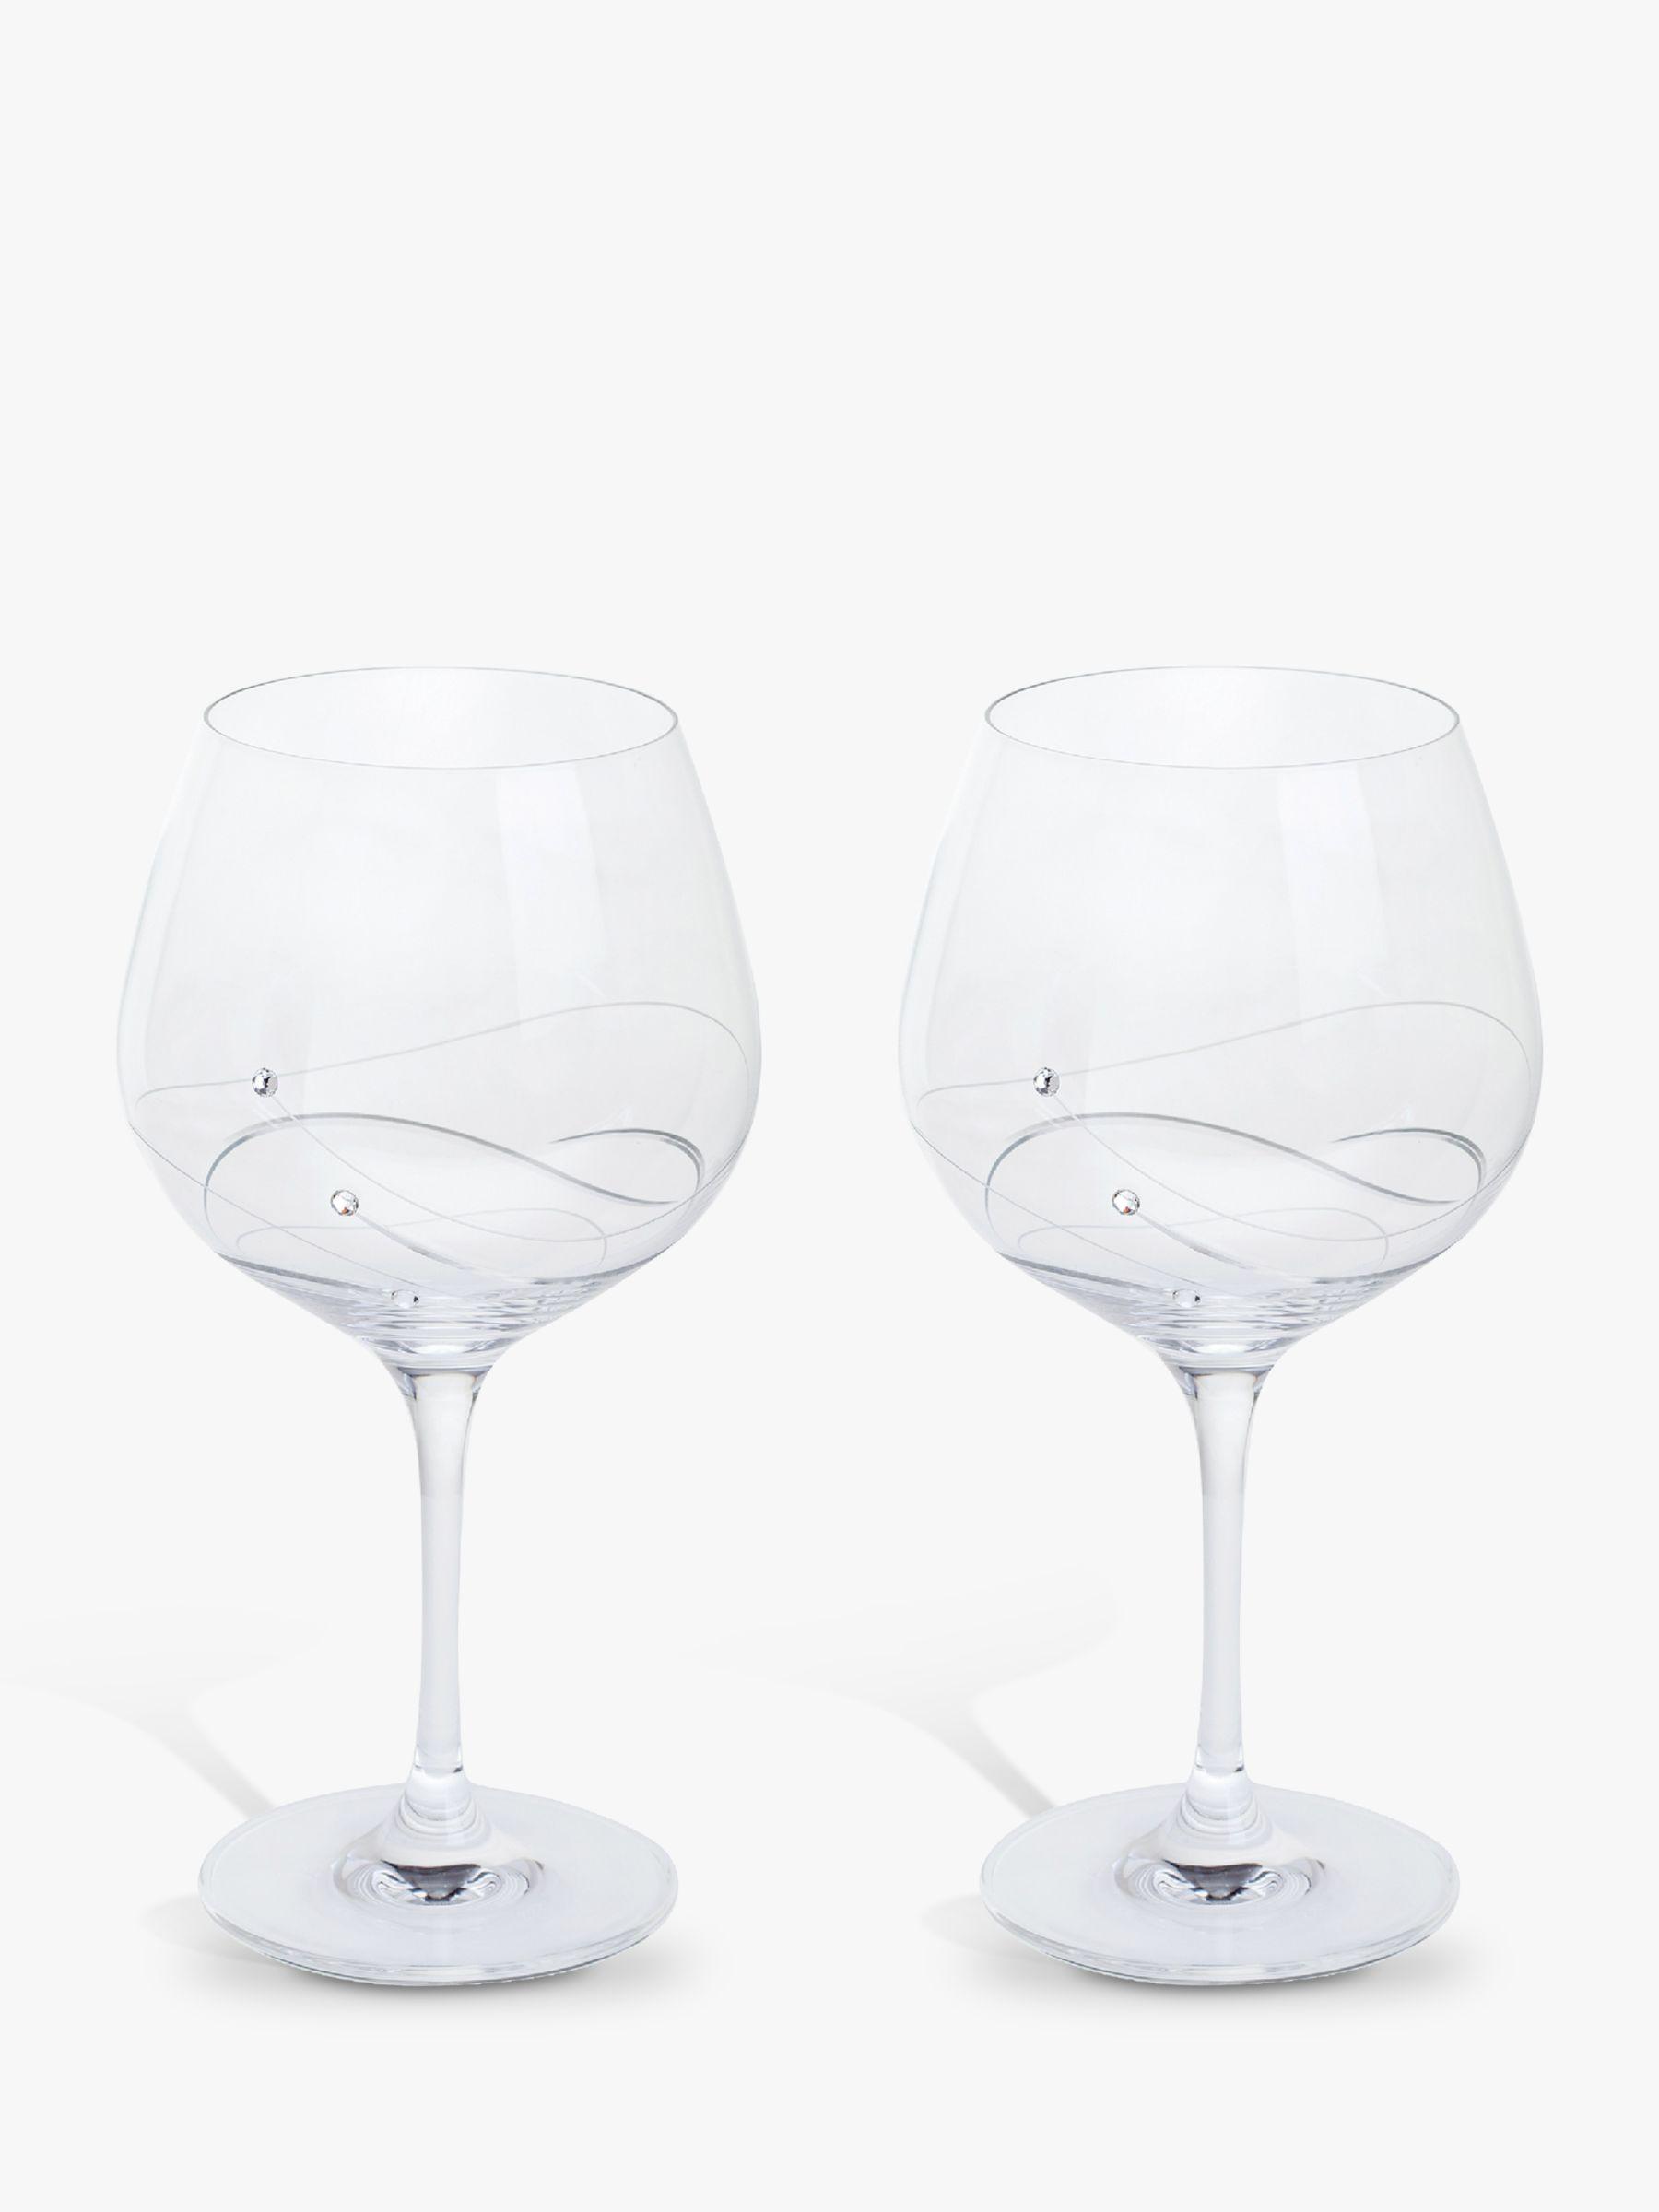 Dartington Crystal Dartington Crystal Glitz Gin and Tonic Copa Glass, 610ml, Set of 2